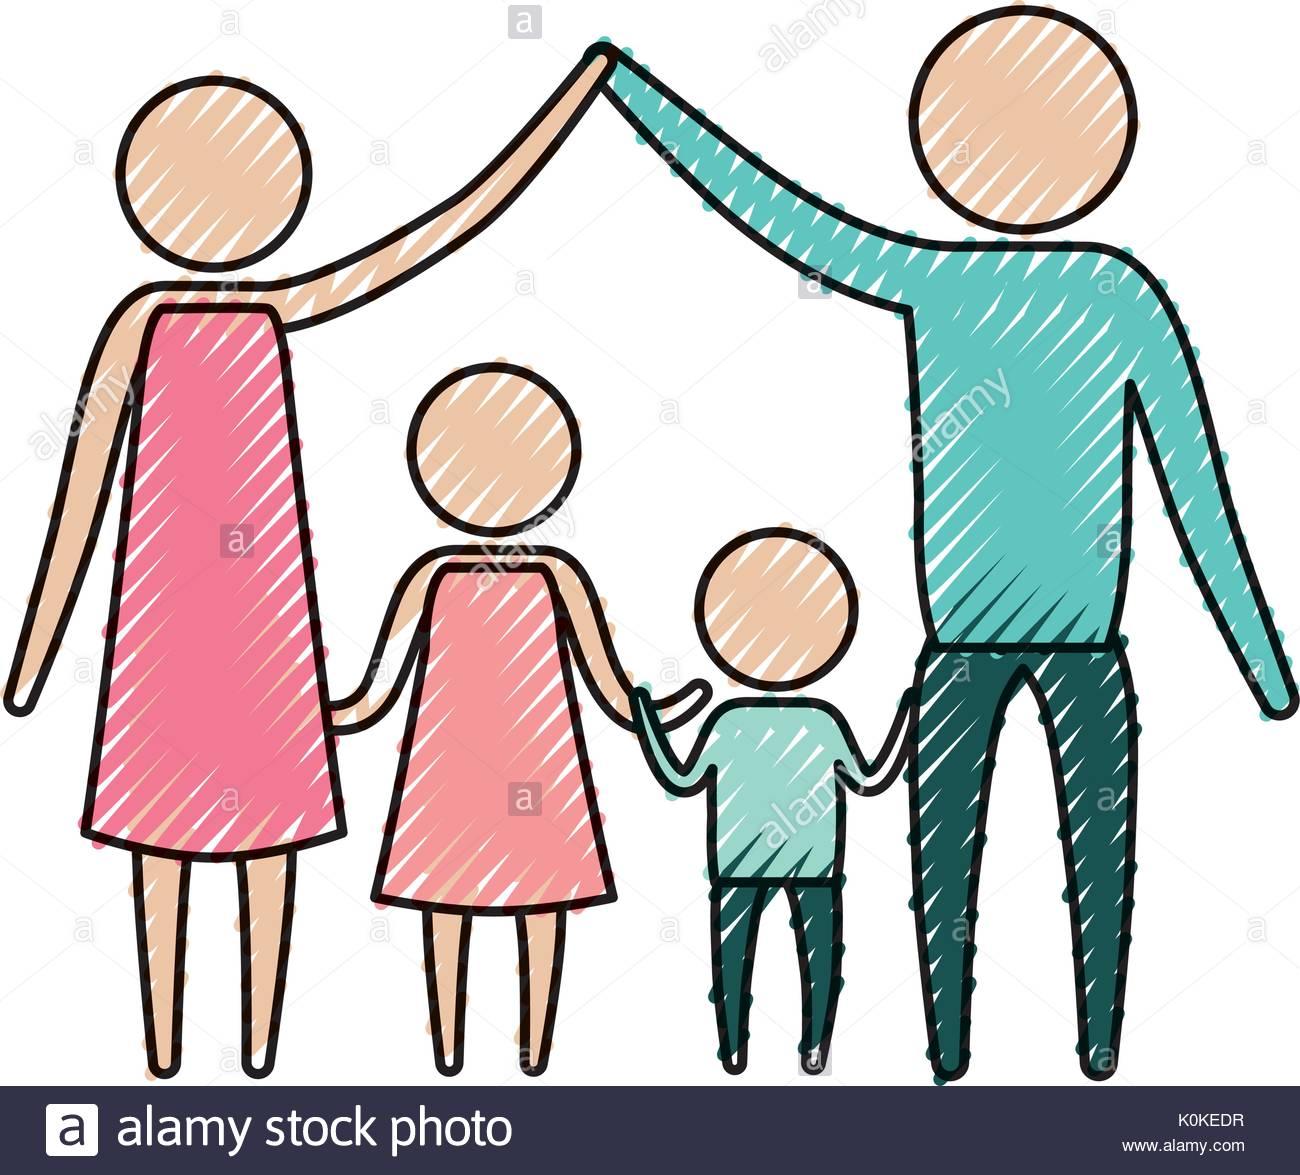 1300x1175 Color Crayon Silhouette Pictogram Parents Holding Hands Up